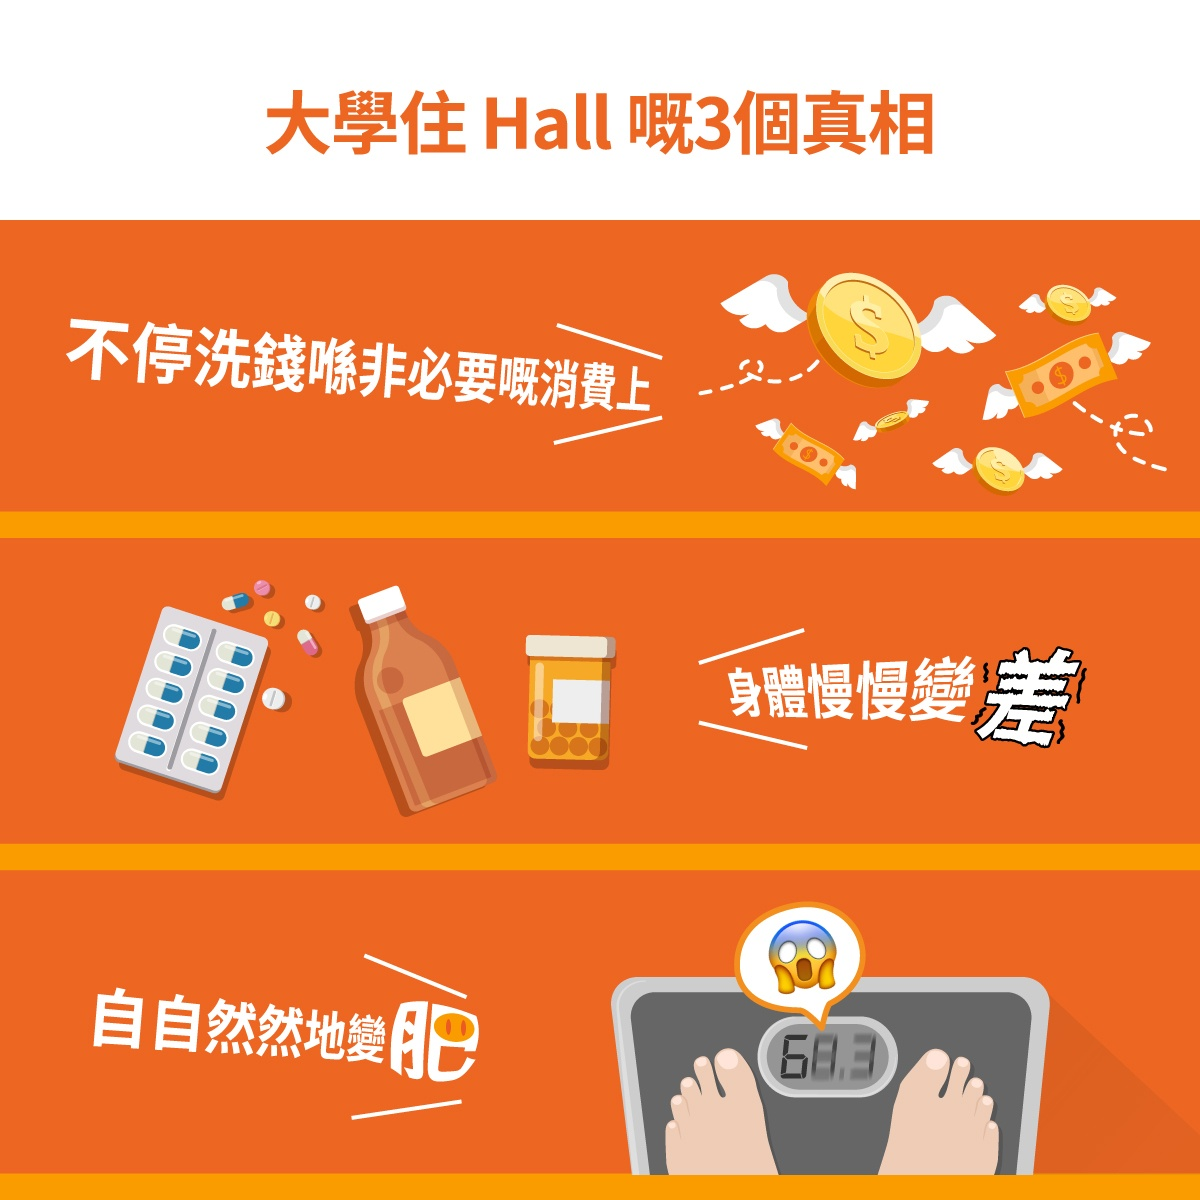 HK_hall_20180827-01